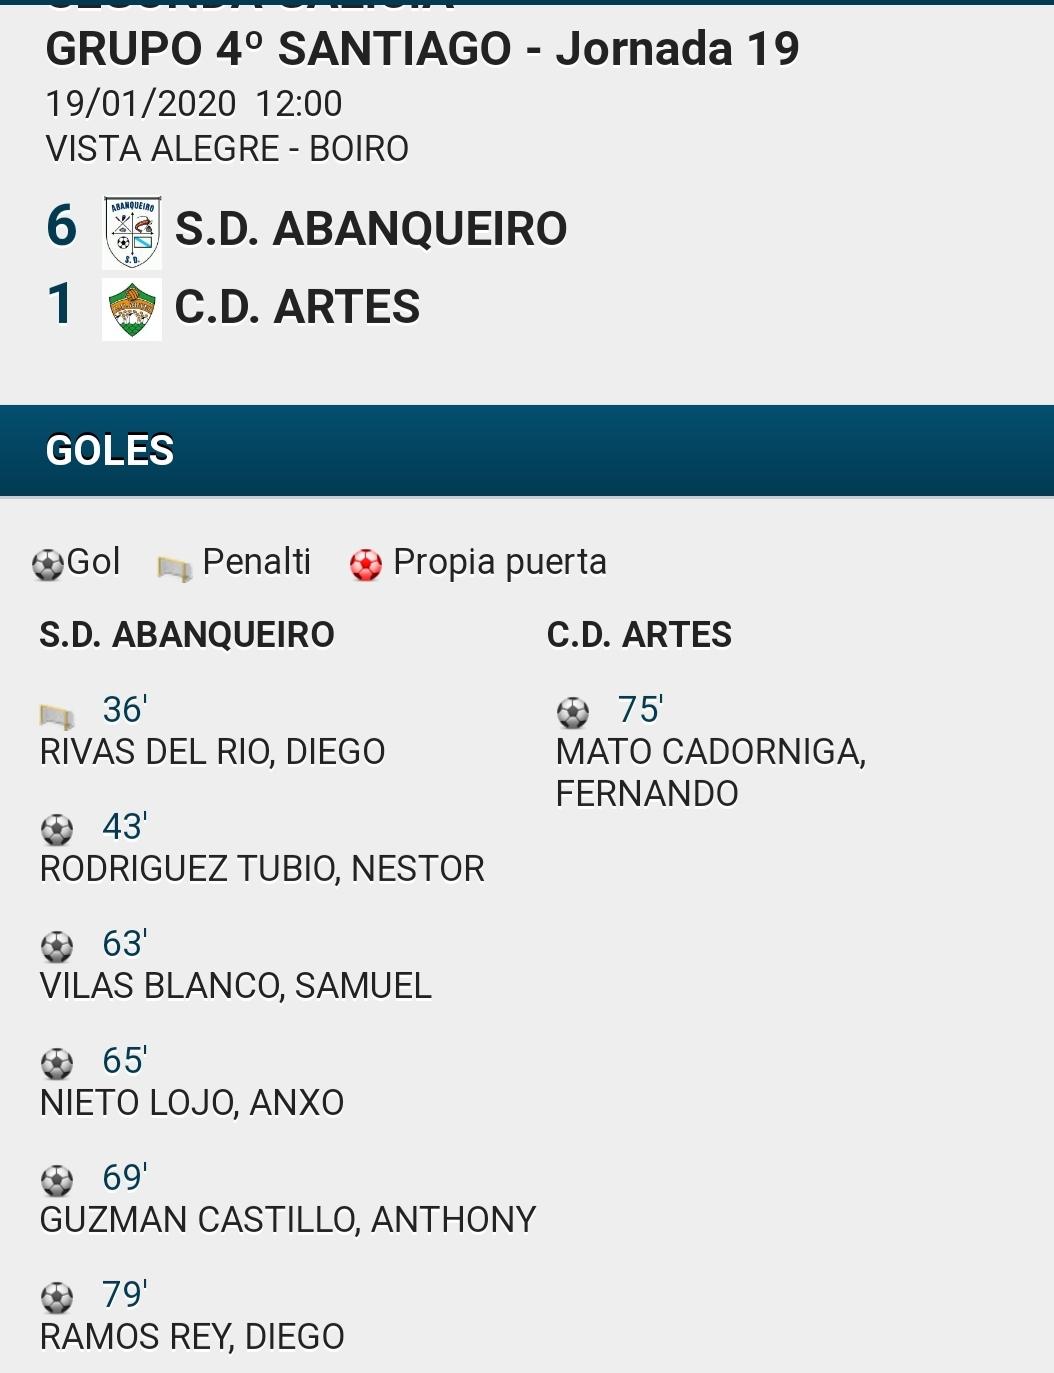 VICTORIA DO FILIAL ABANQUEIRO ANTE O C.D.ARTES